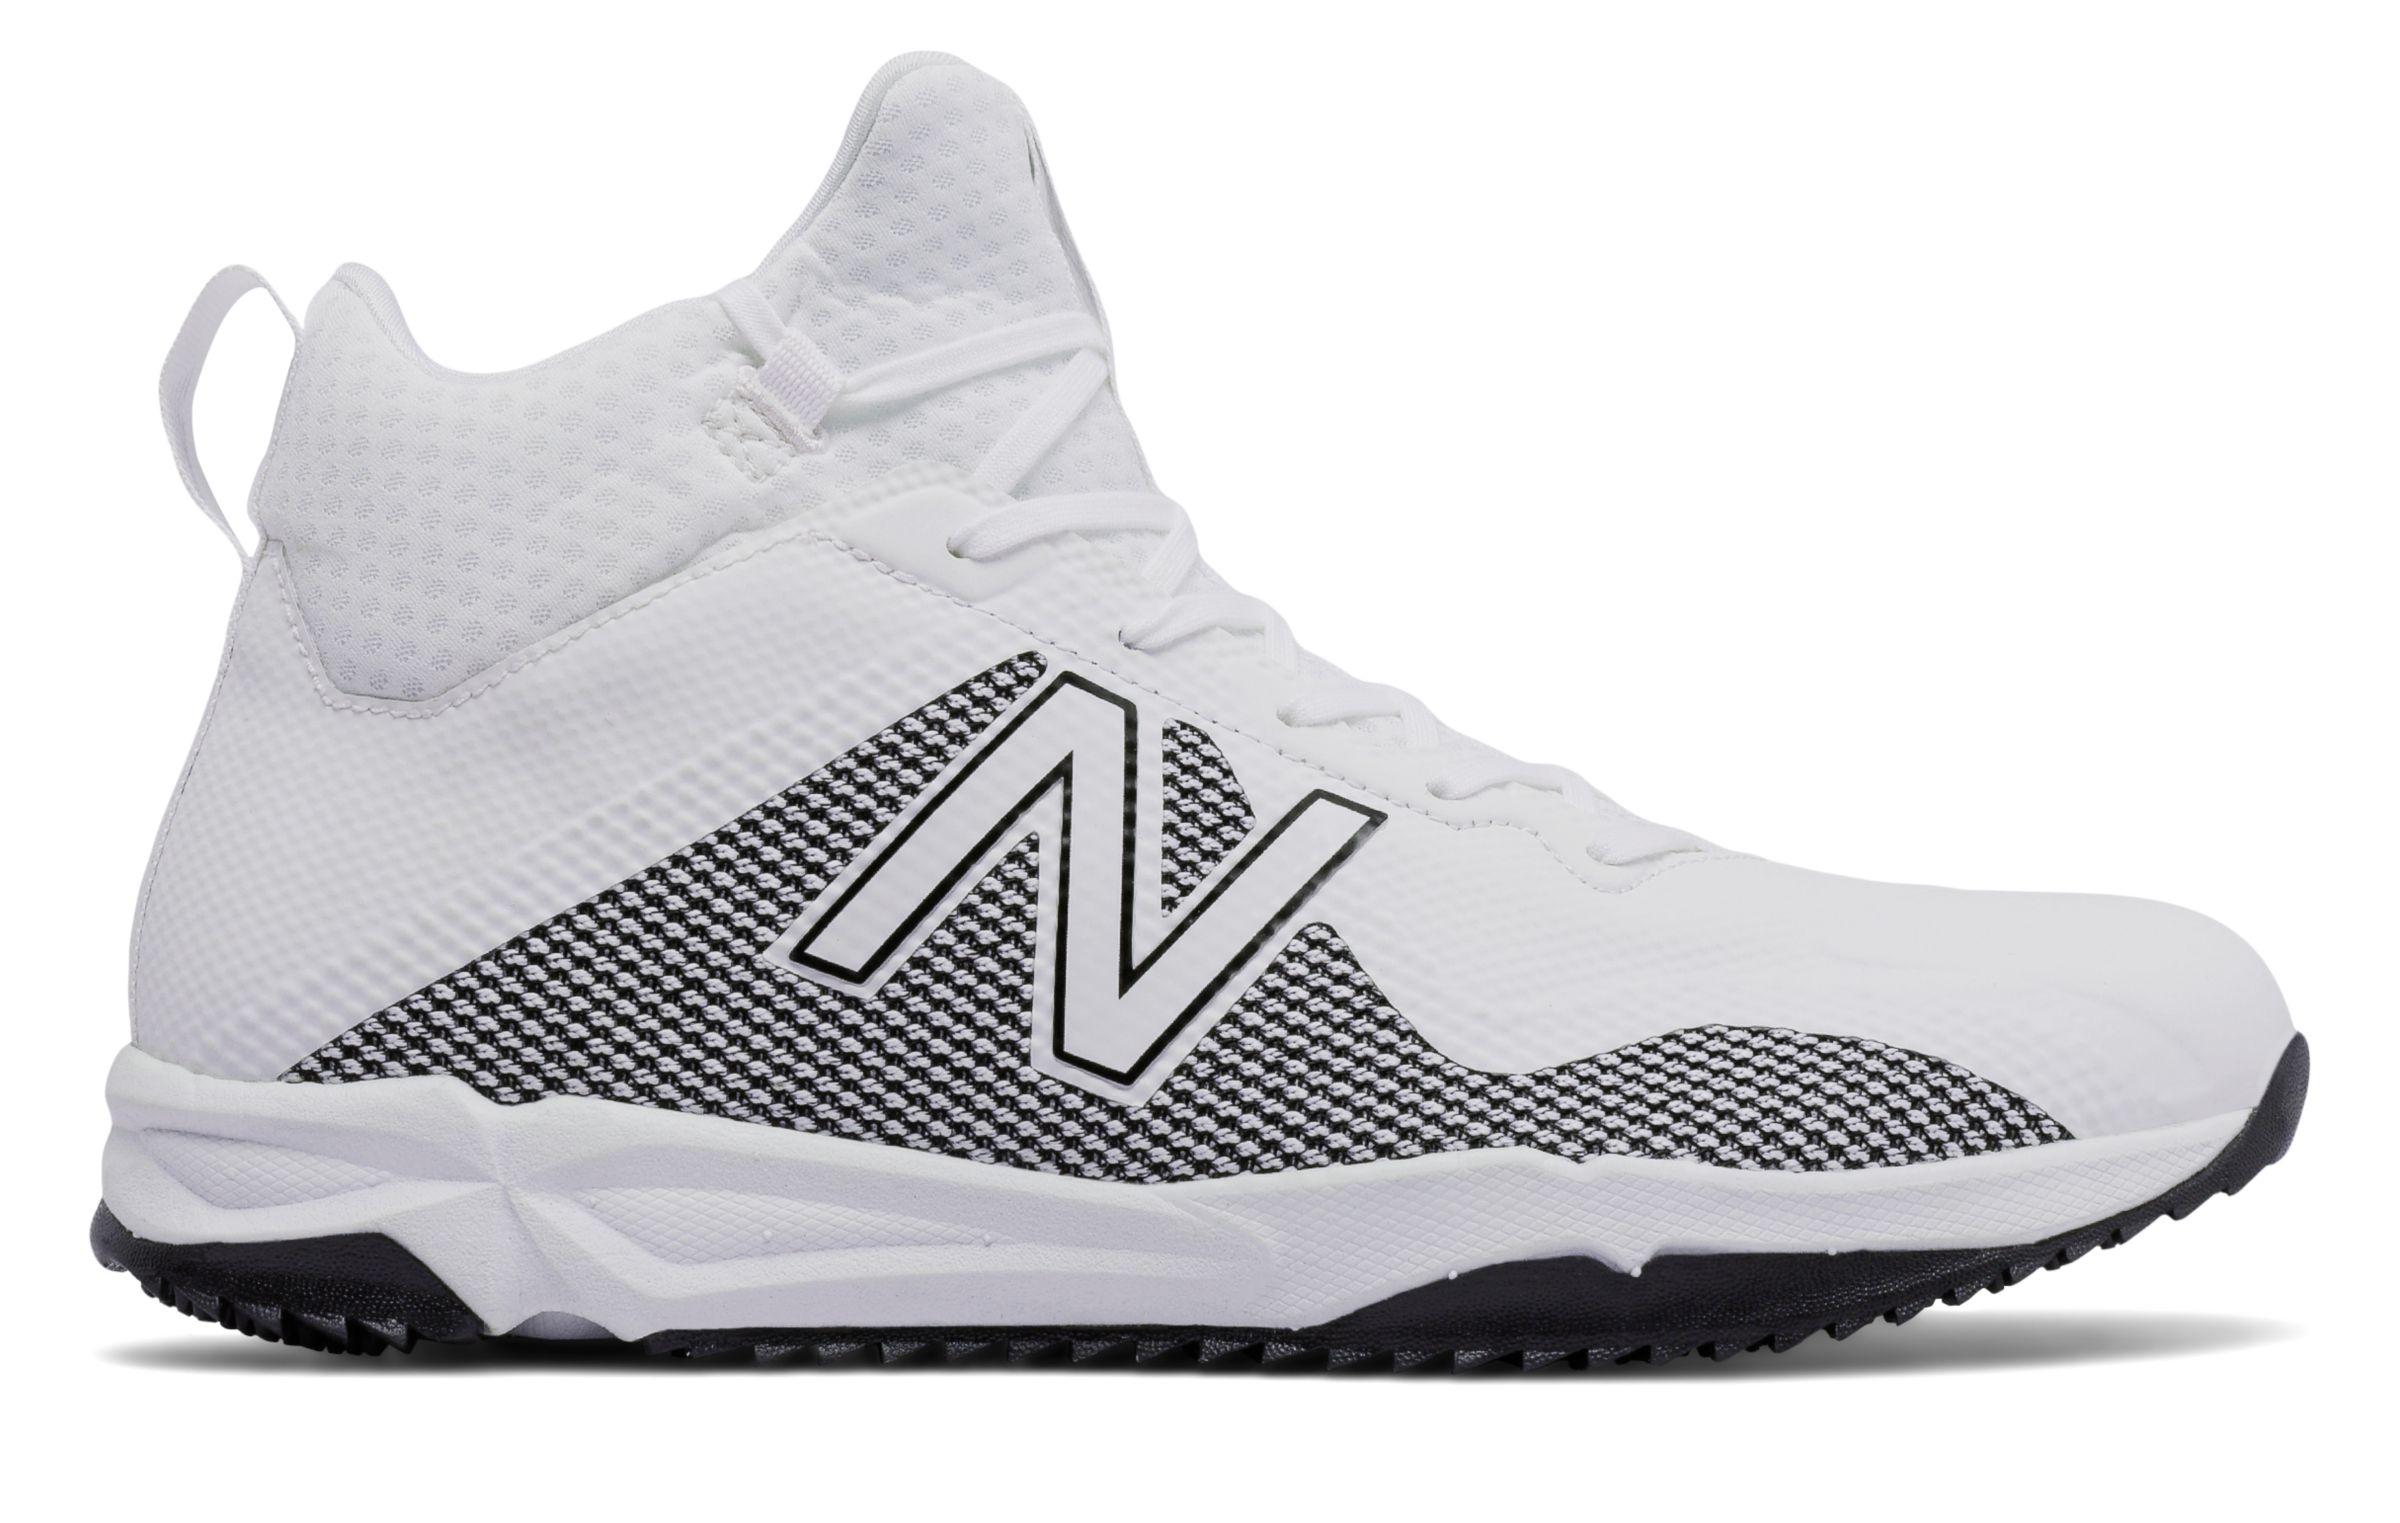 7dfe51465576c New Balance Men's Freezelx Lacrosse Turf Comfortable Shoes White ...